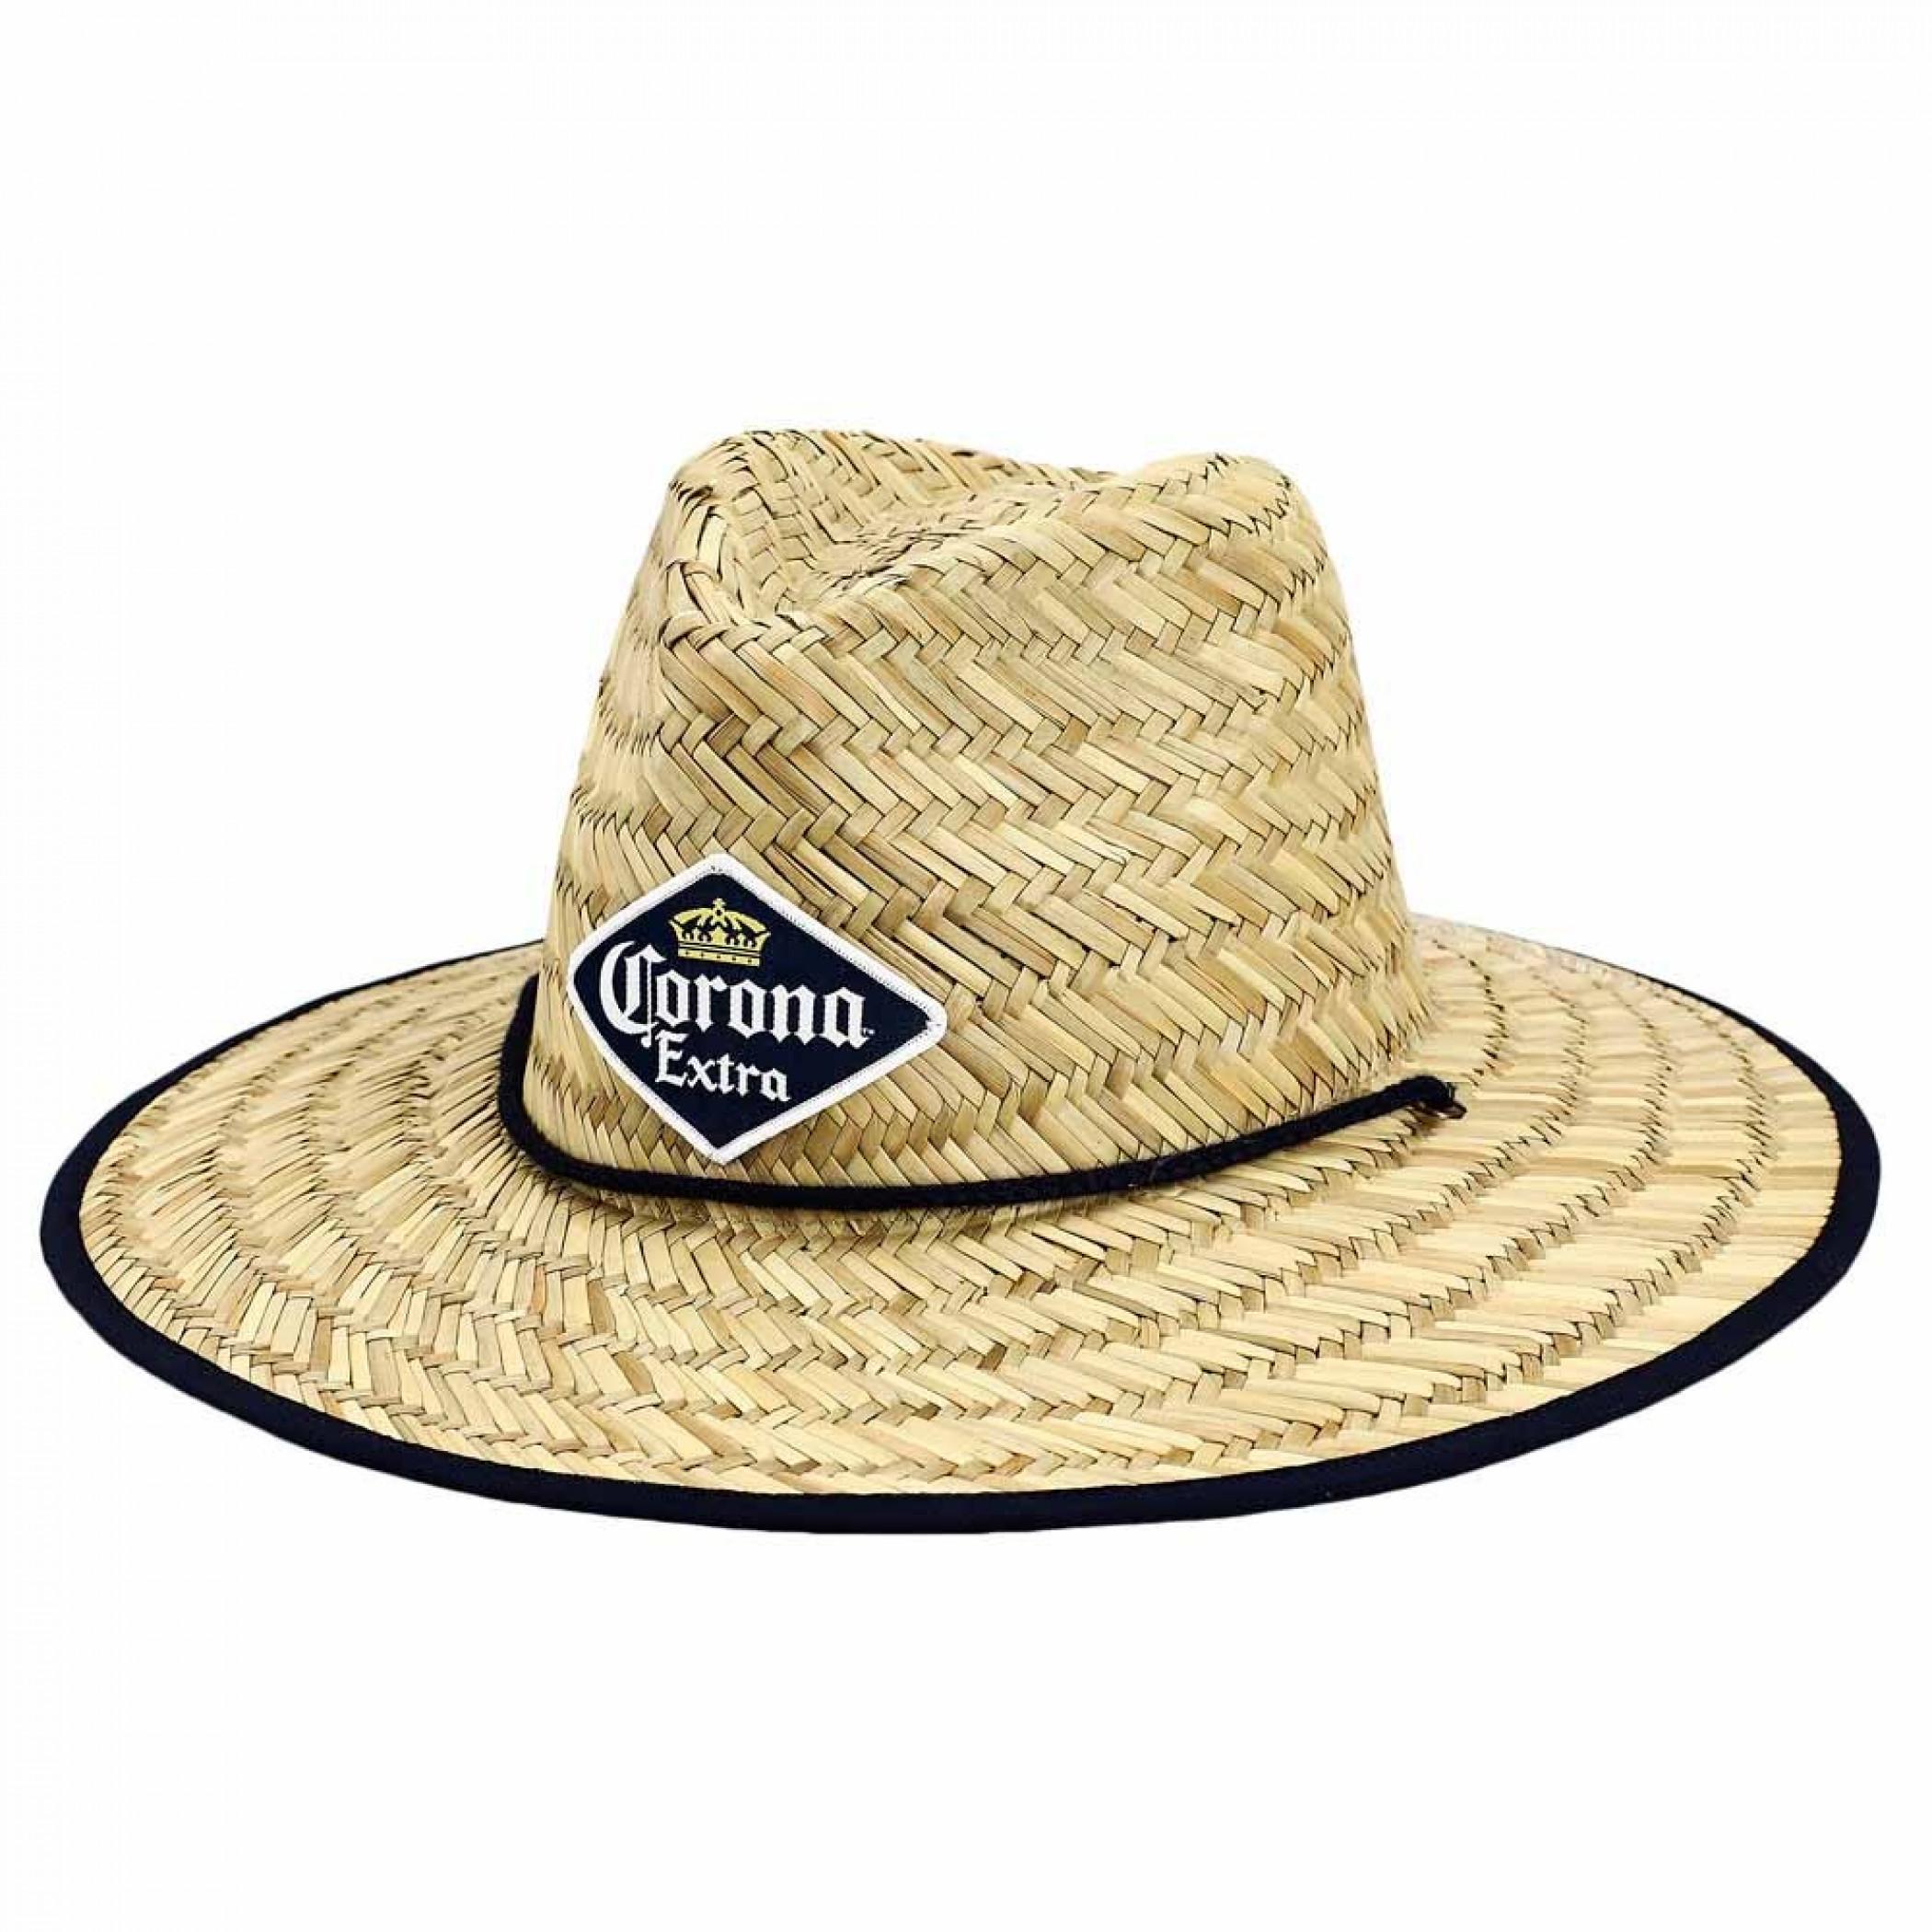 Corona Extra Patch Straw Lifeguard Beach Sun Hat